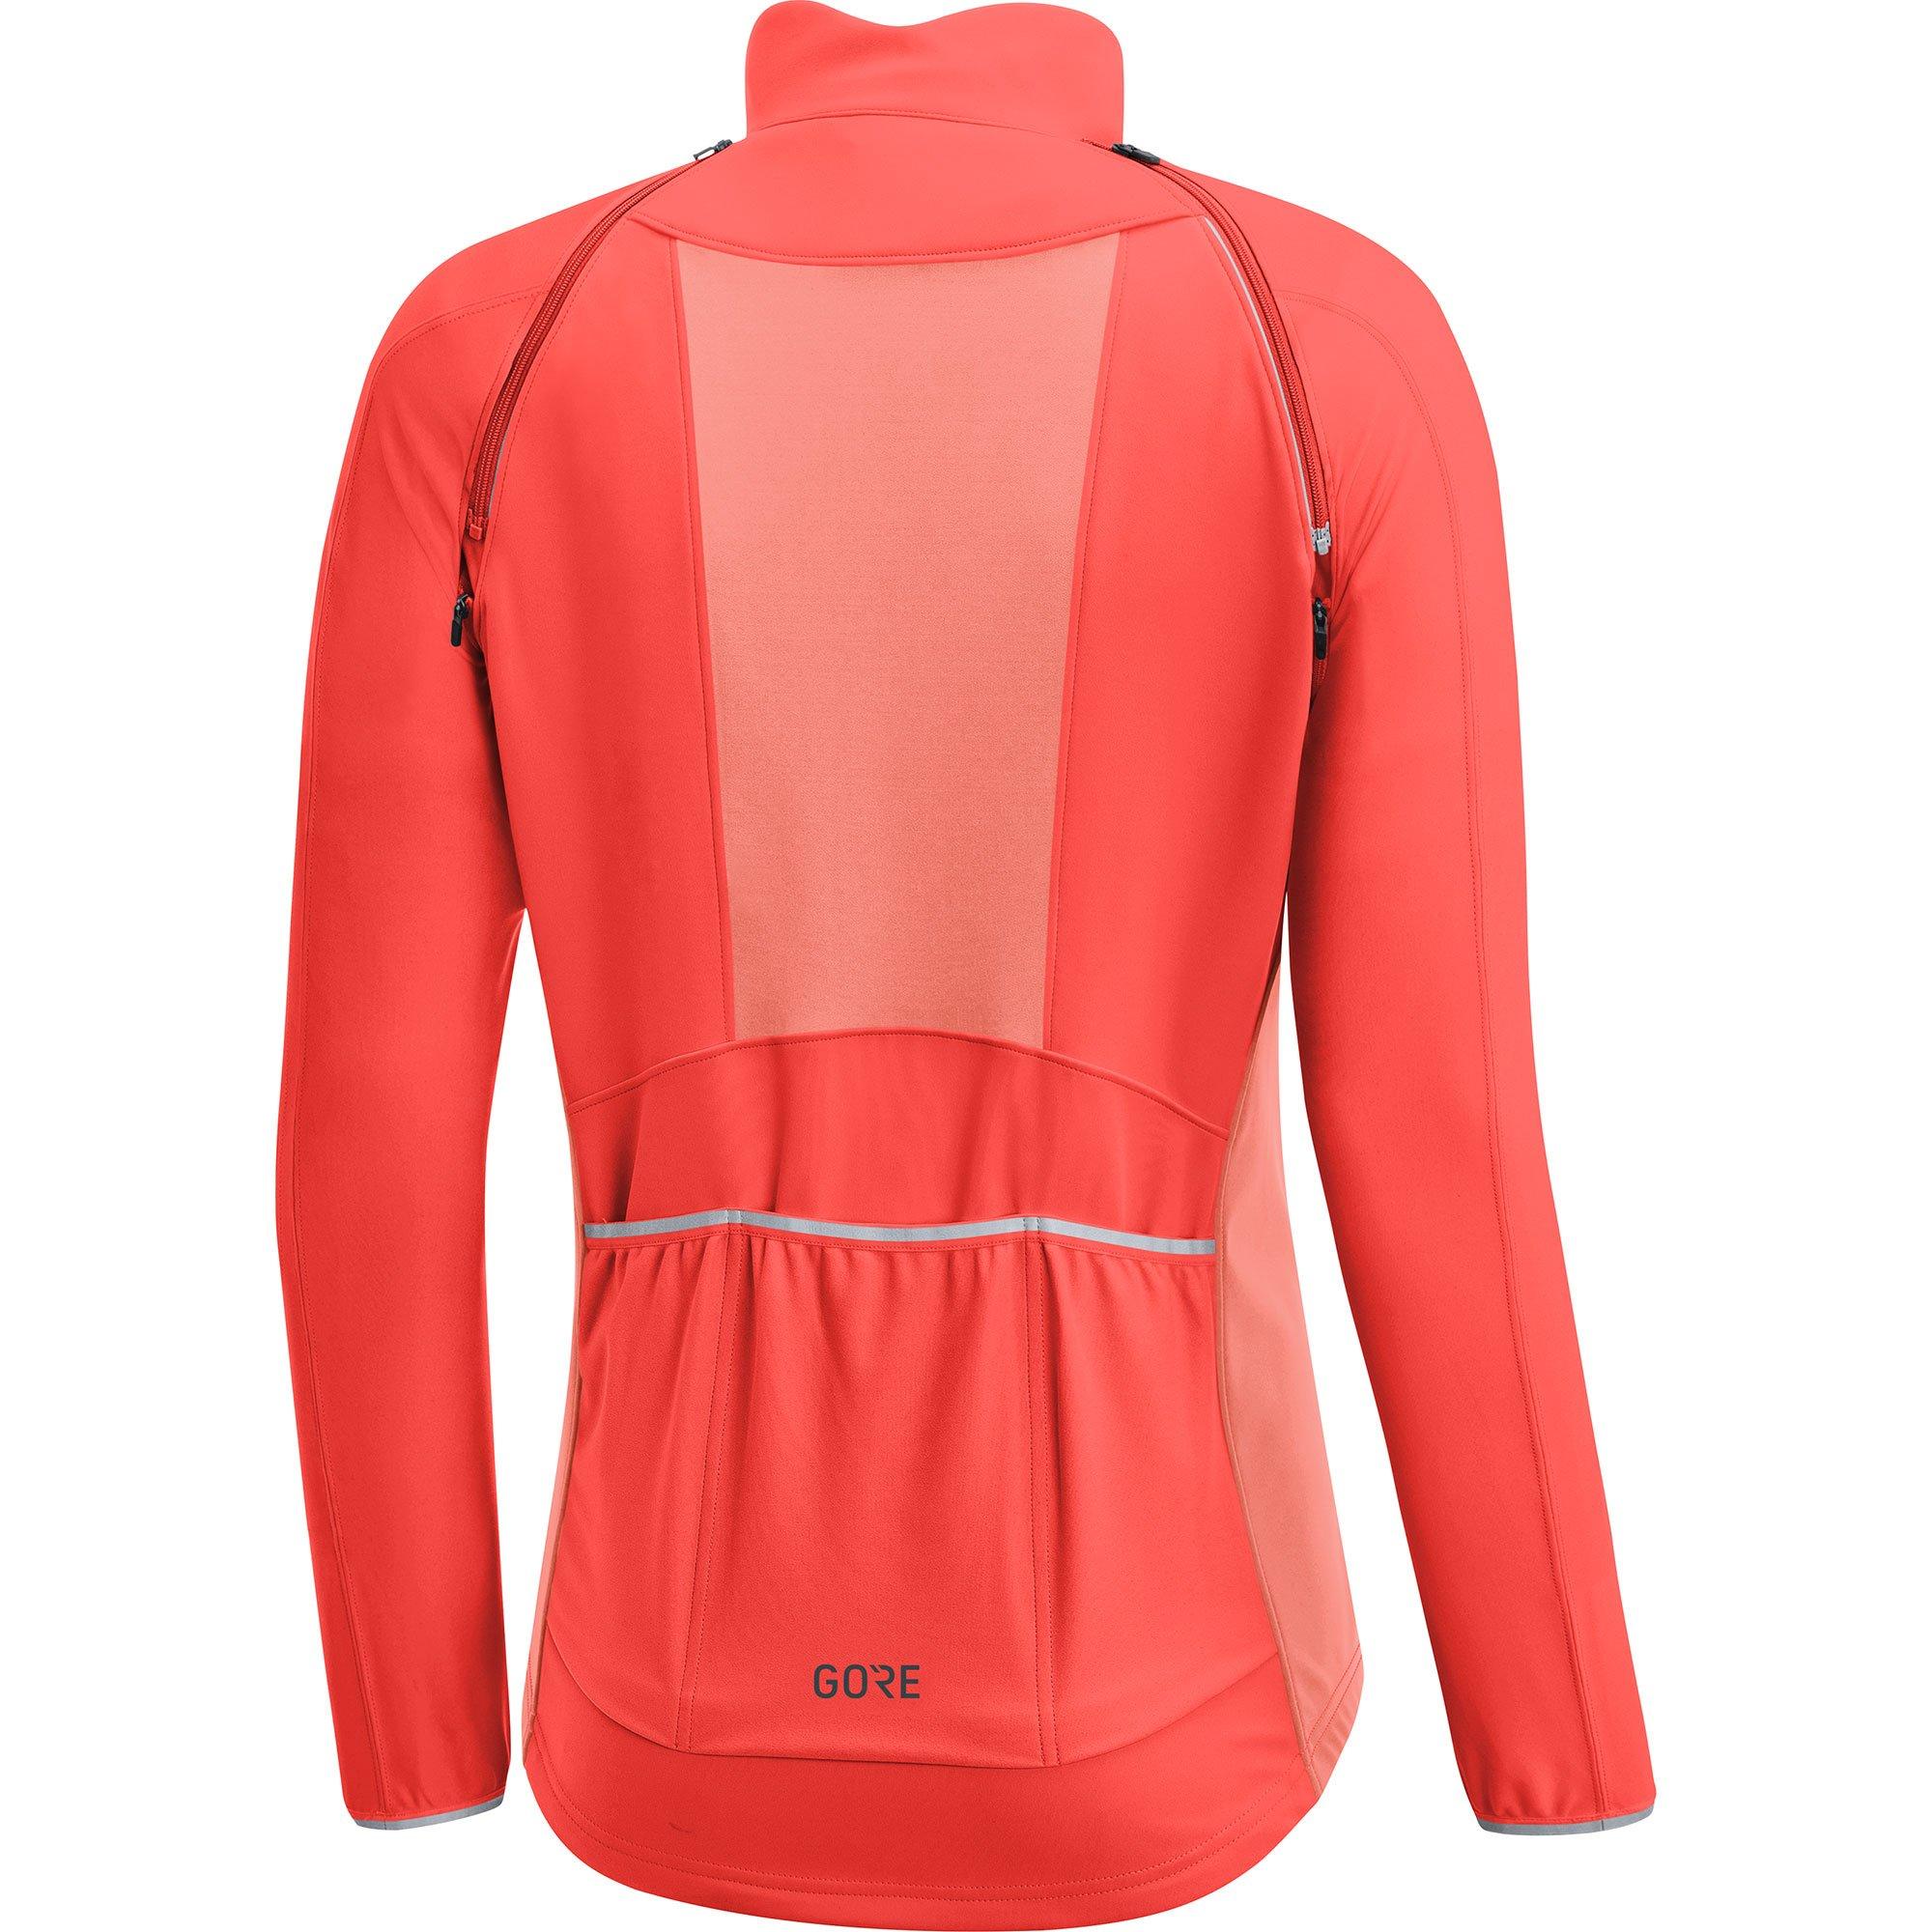 GORE Wear Women's Windproof Cycling Jacket, Removable Sleeves, GORE Wear C3 Women's GORE Wear WINDSTOPPER Phantom Zip-Off Jacket, Size: M, Color: Lumi Orange/Coral Glow, 100191 by GORE WEAR (Image #3)